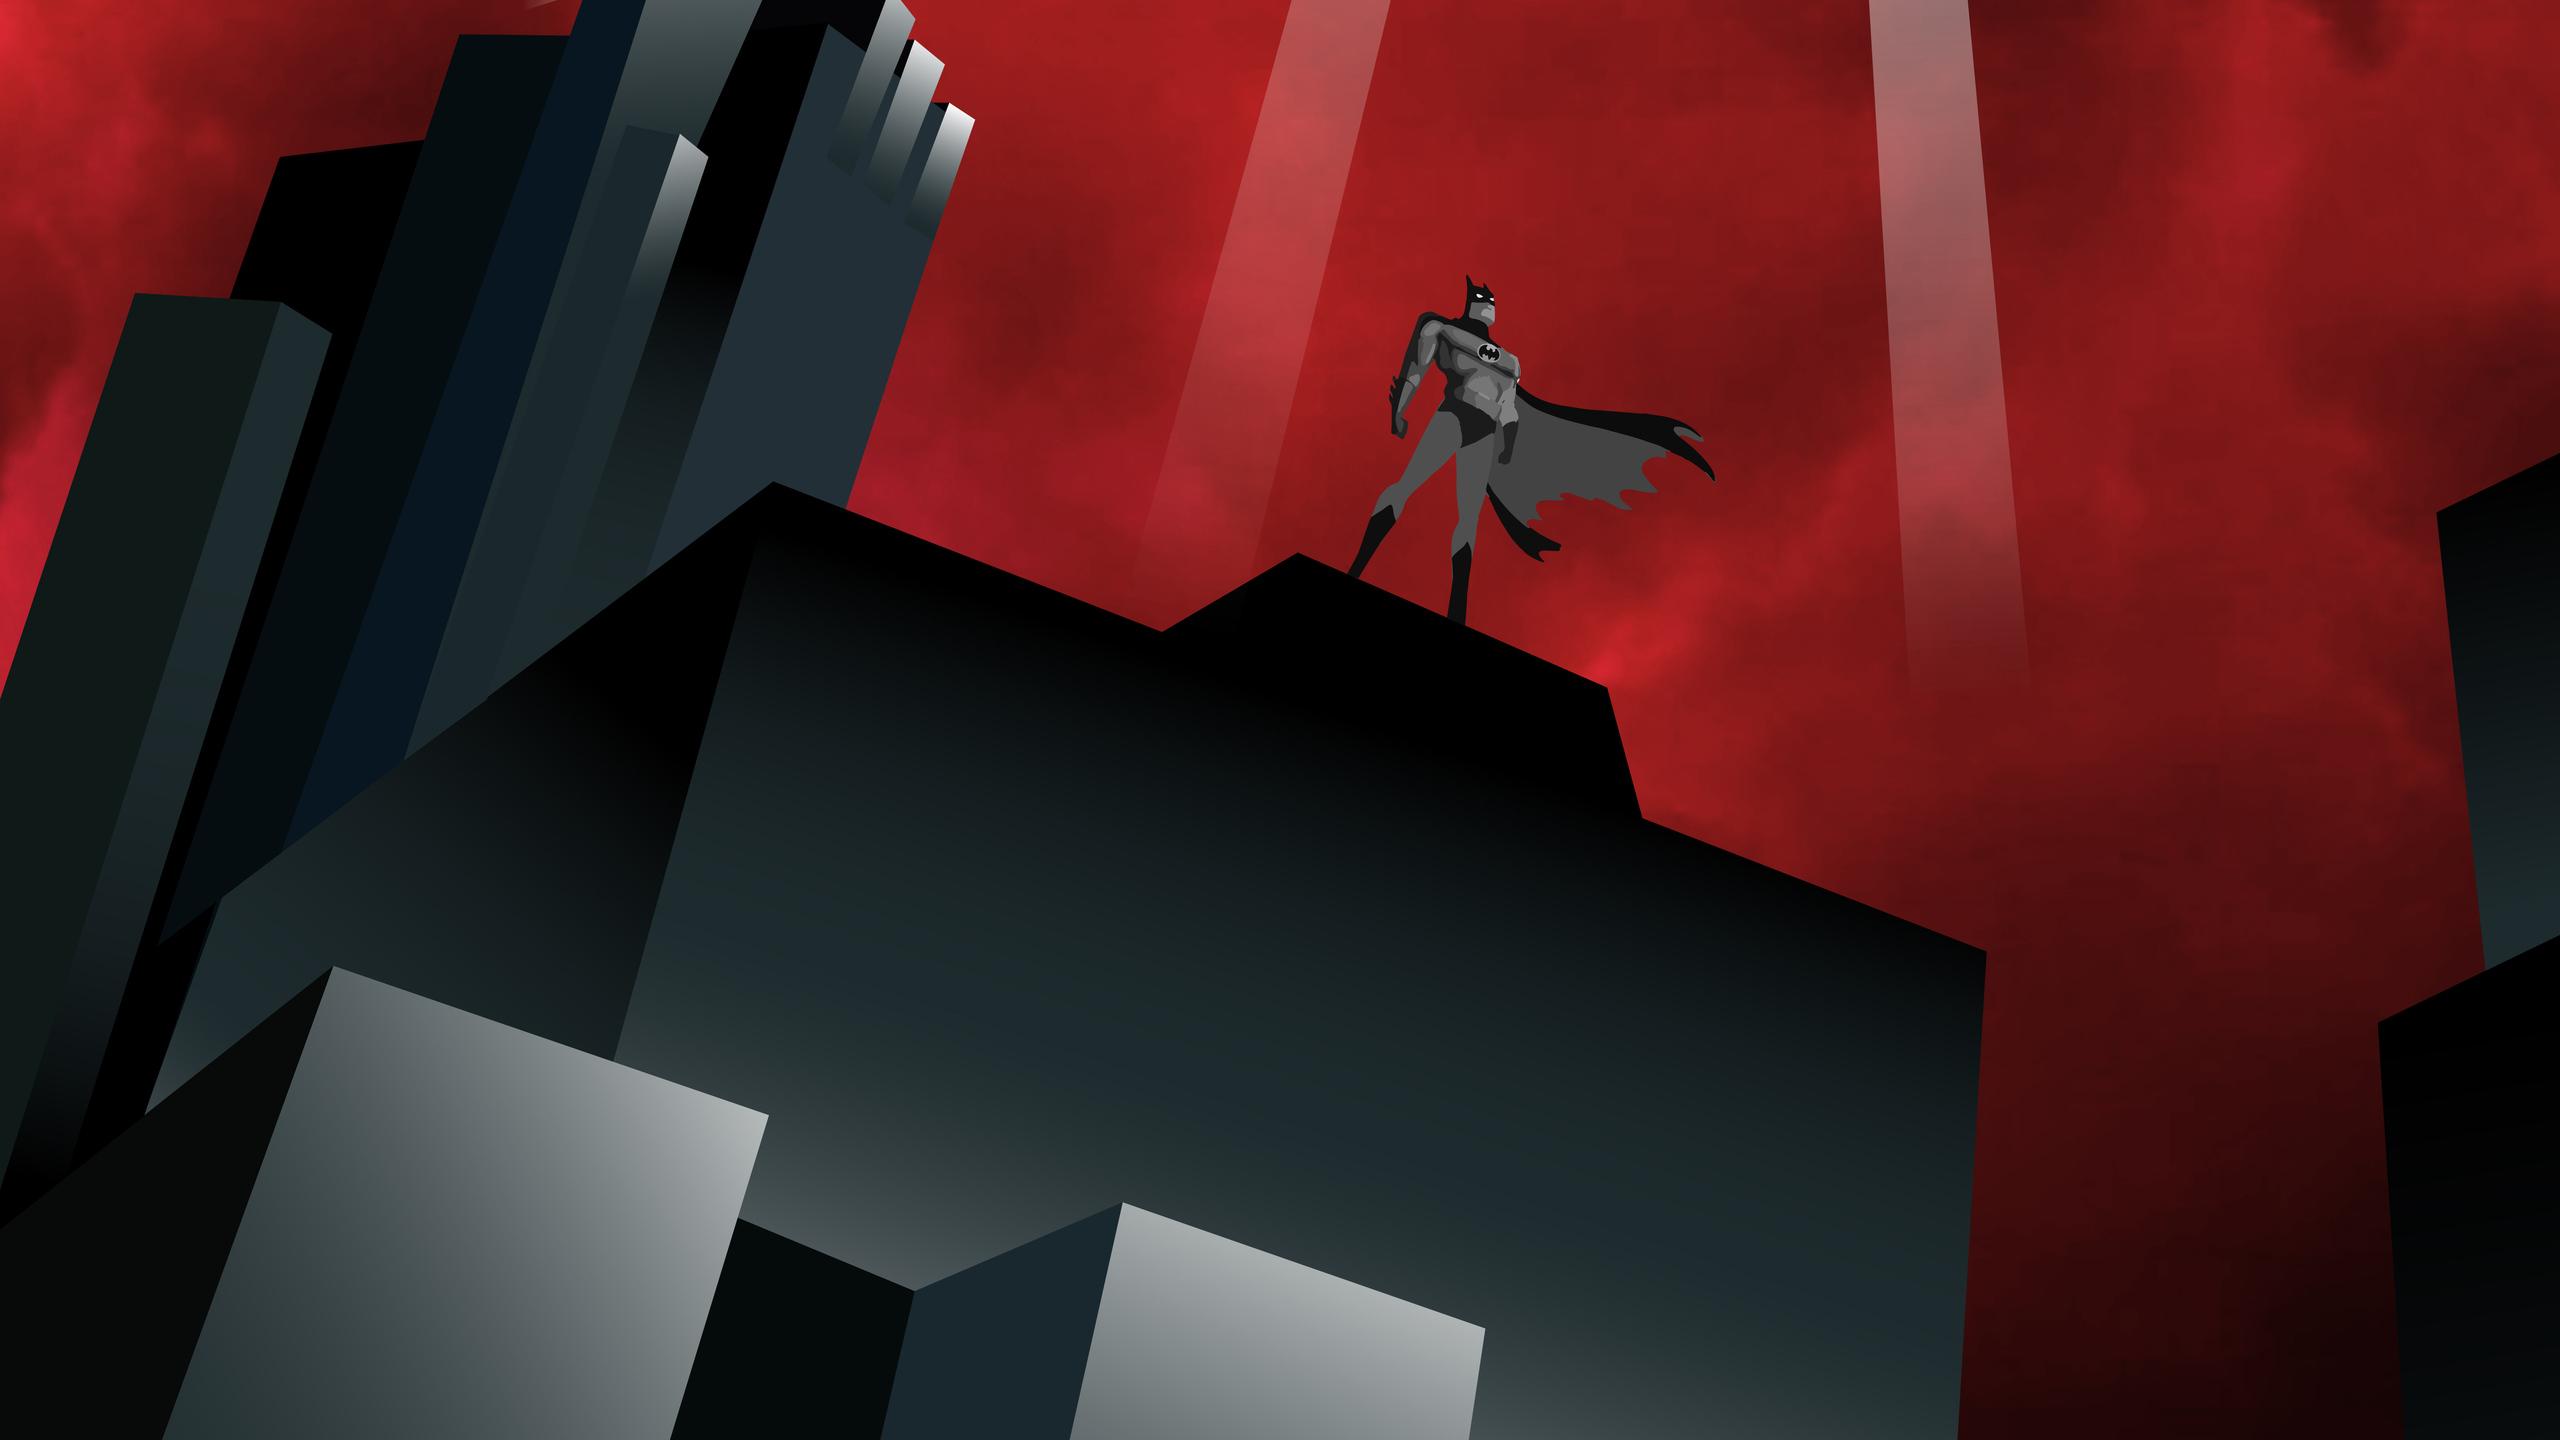 2560x1440 Batman The Animated Series 5k 1440p Resolution Hd